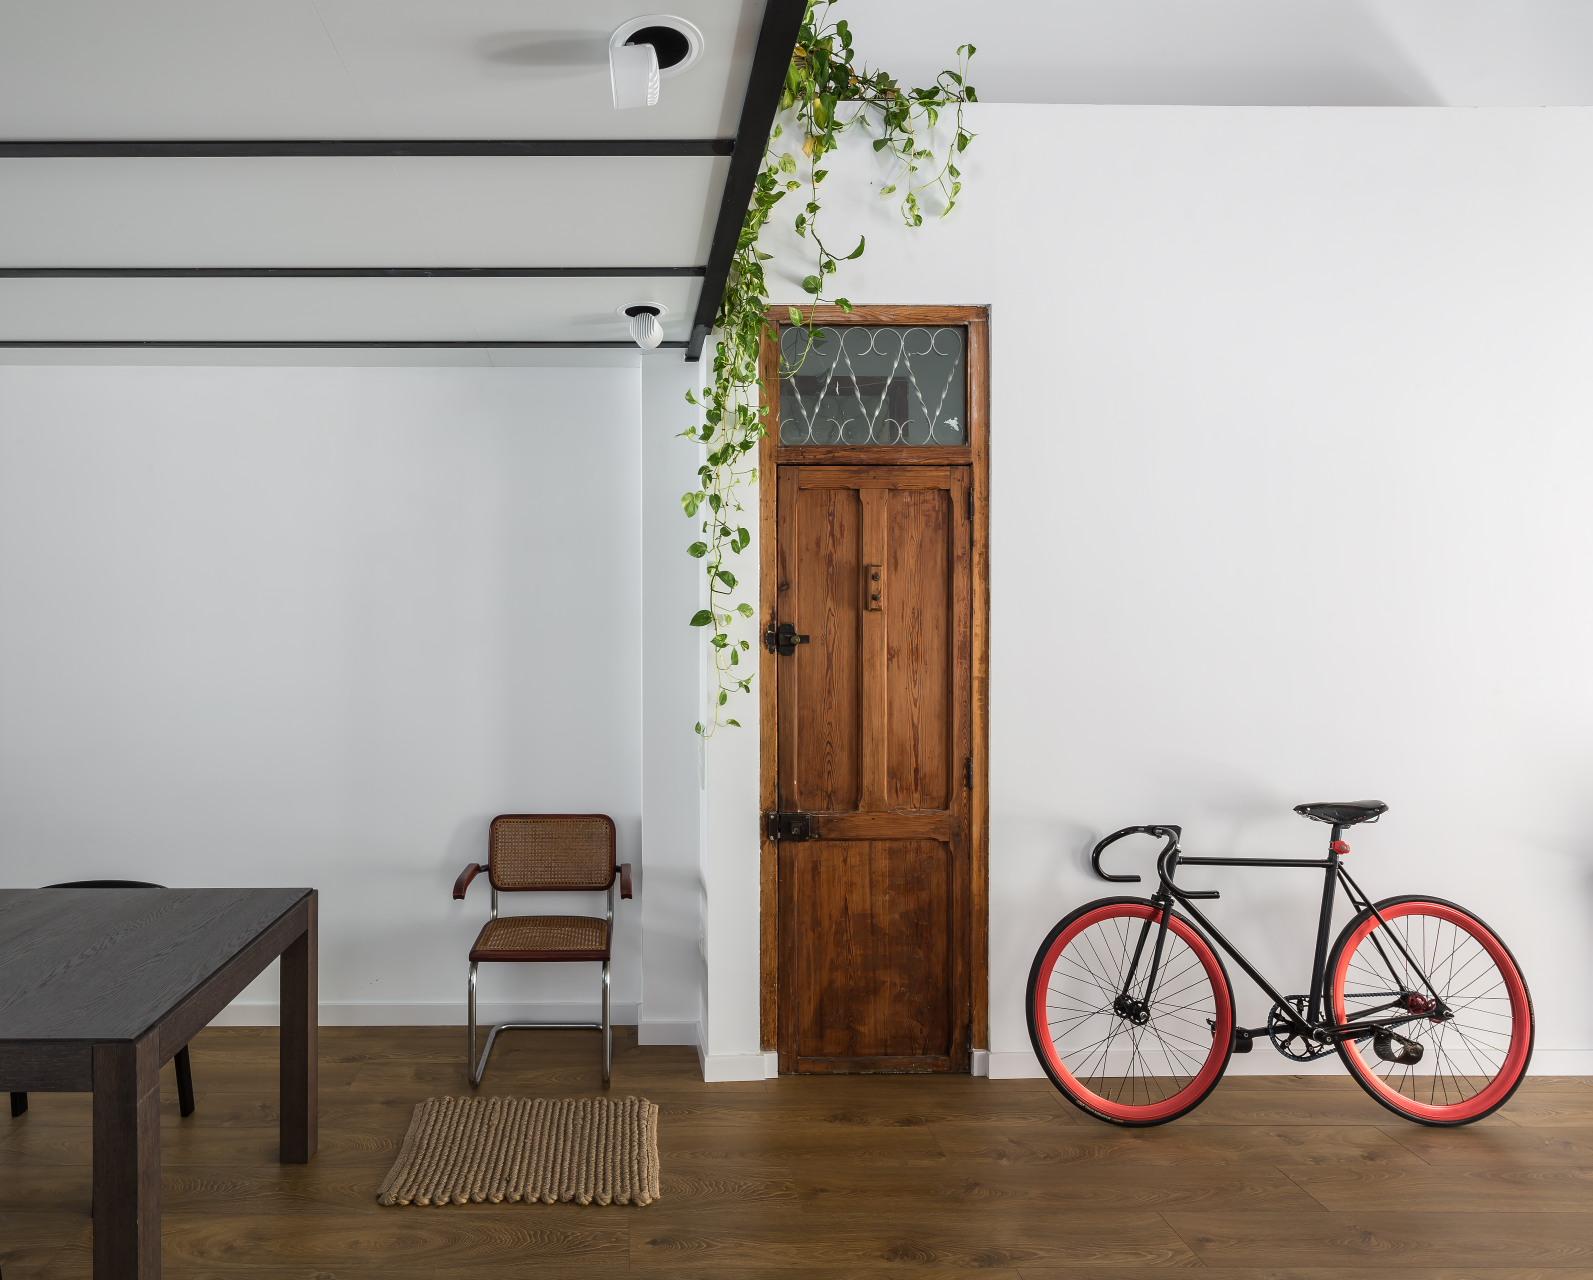 fotografia-arquitectura-valencia-german-cabo-ambau-cabanyal (1)